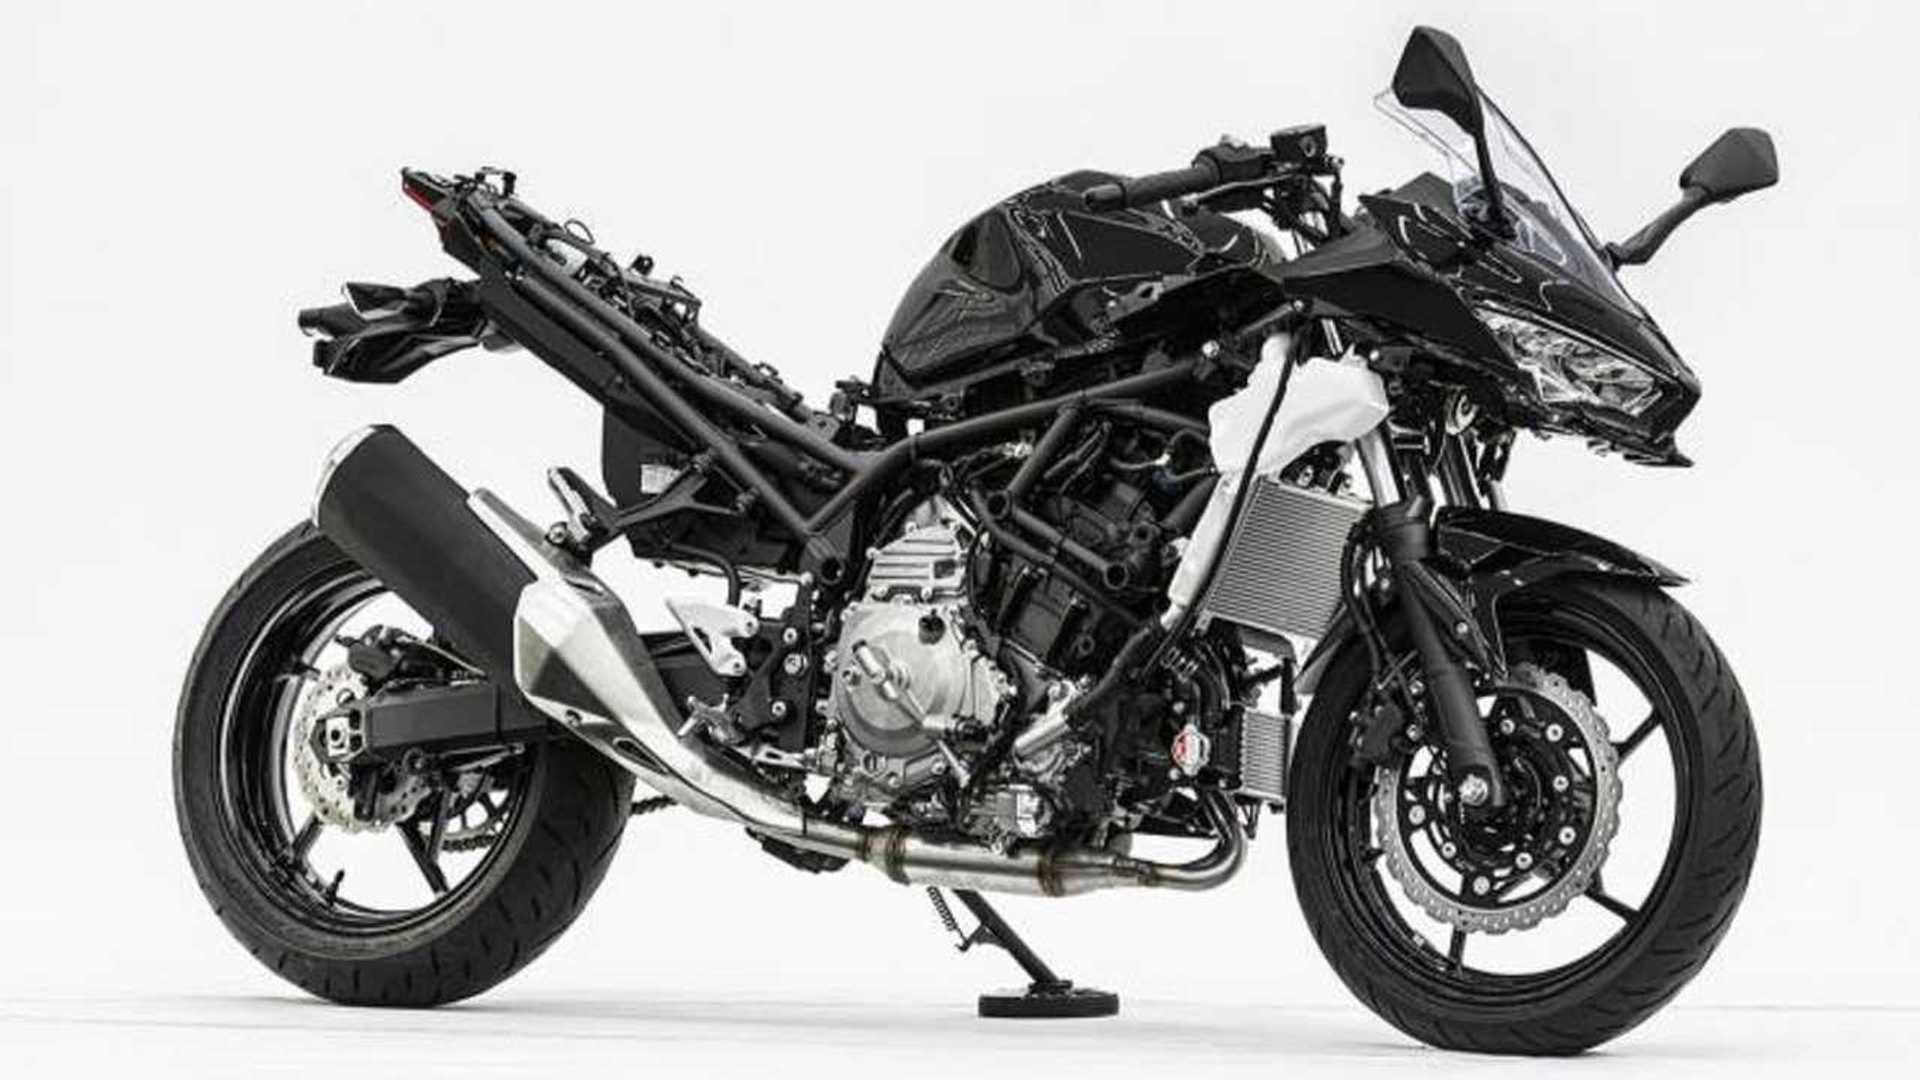 Kawasaki Lifts Cover On Its Gas-Electric Hybrid Prototype Bike